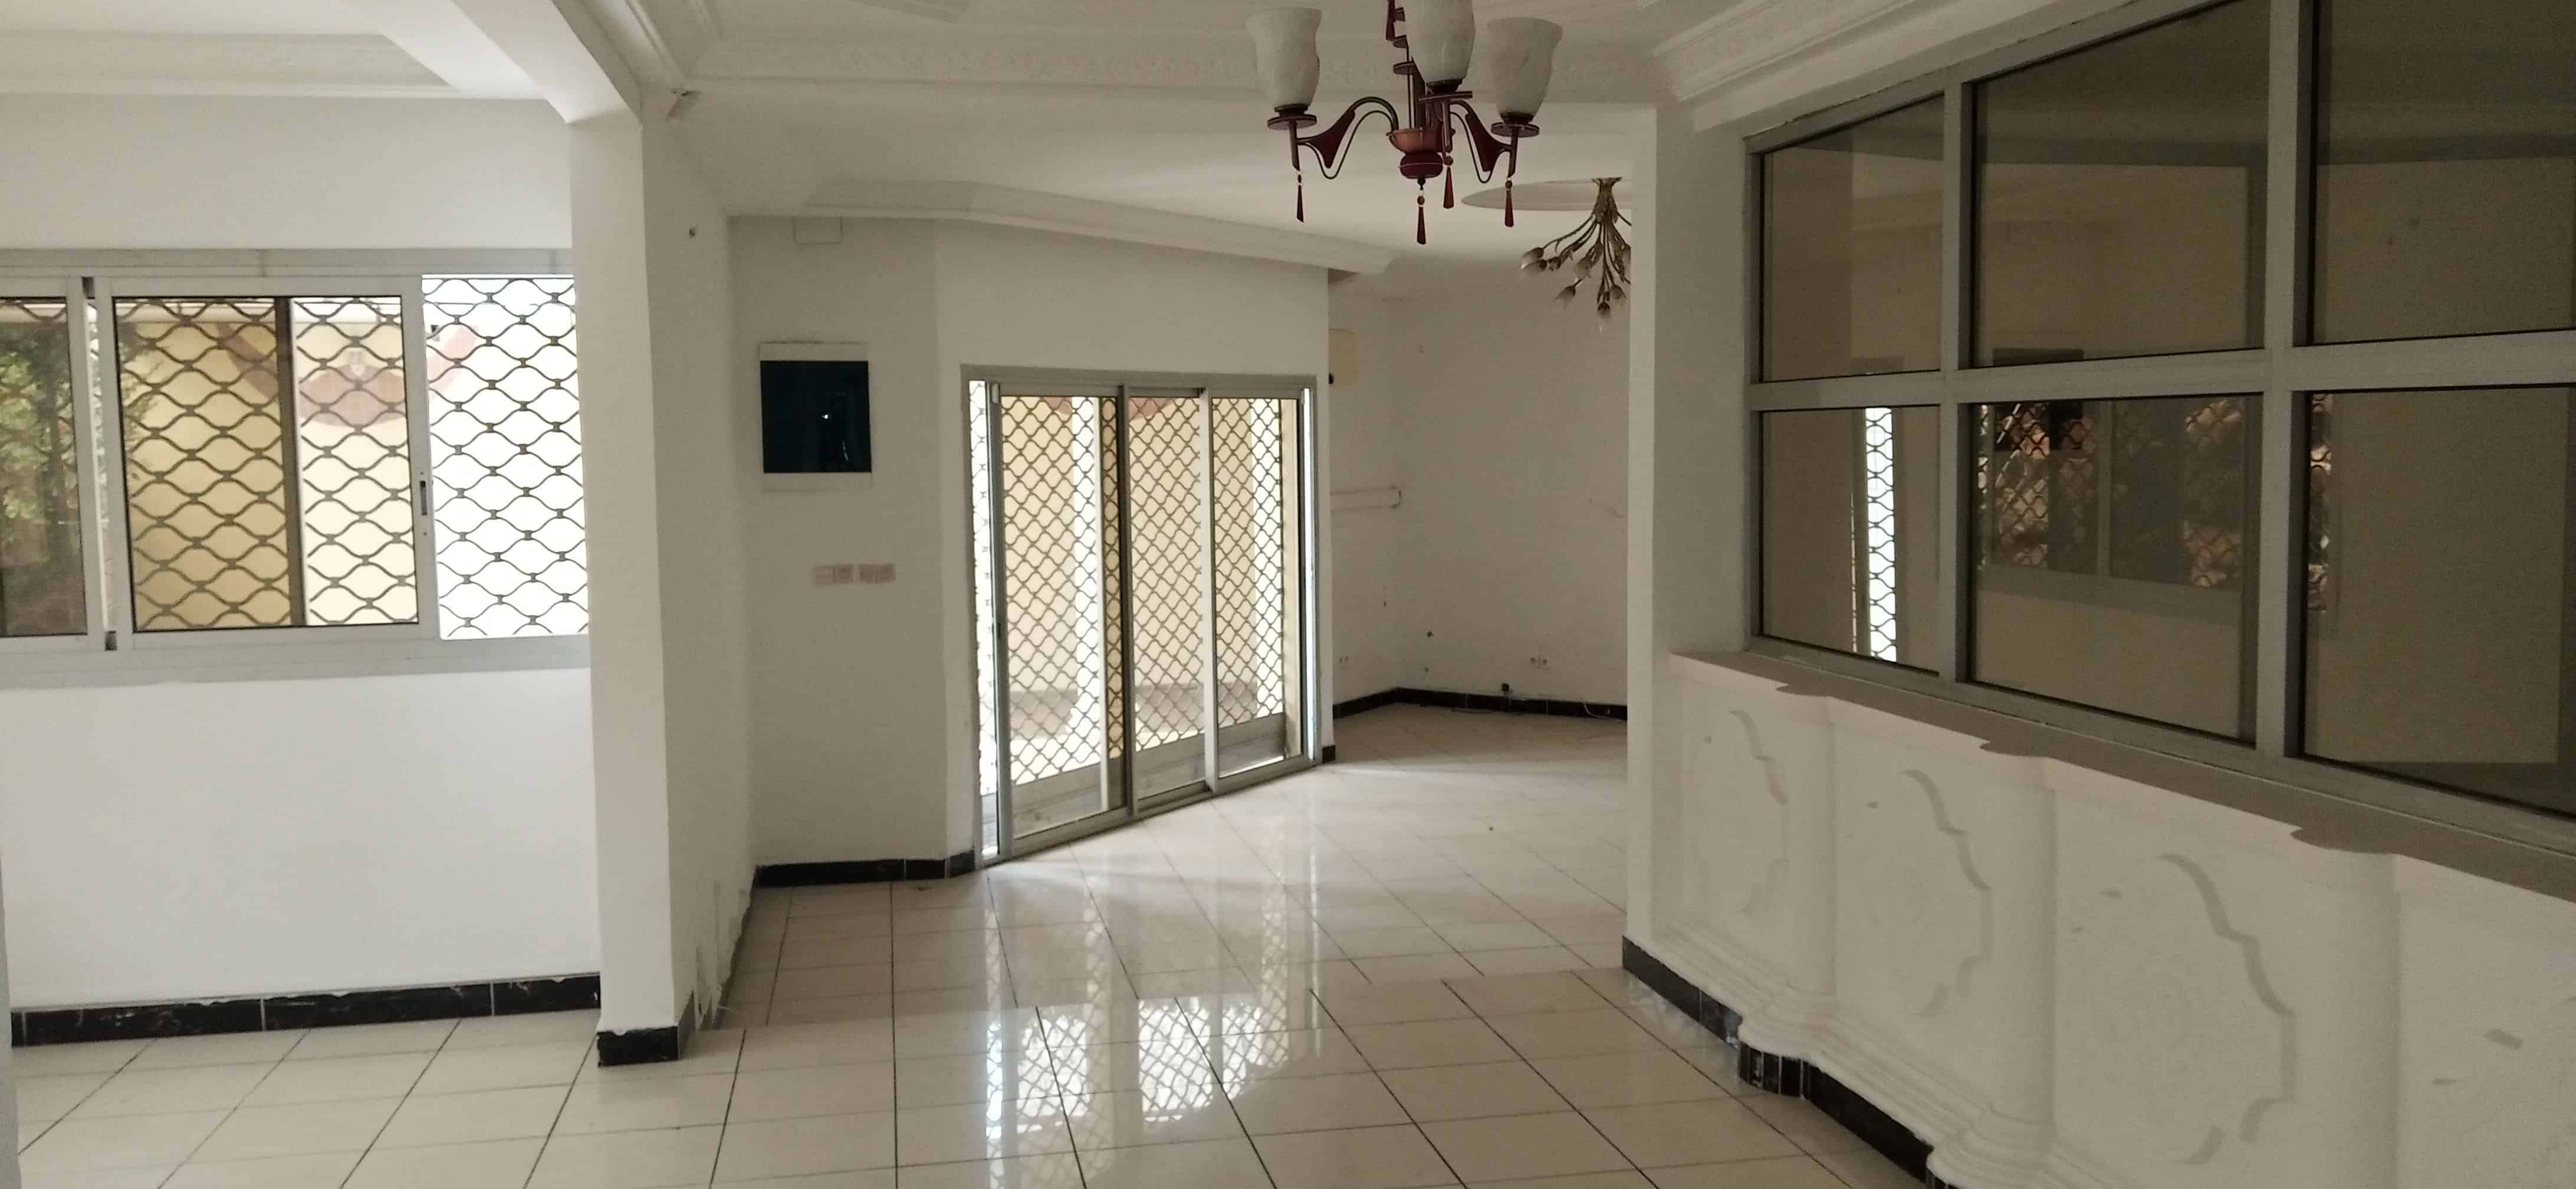 House (Villa) to rent - Douala, Bonapriso, Hydrocarbures - 1 living room(s), 4 bedroom(s), 3 bathroom(s) - 2 200 000 FCFA / month